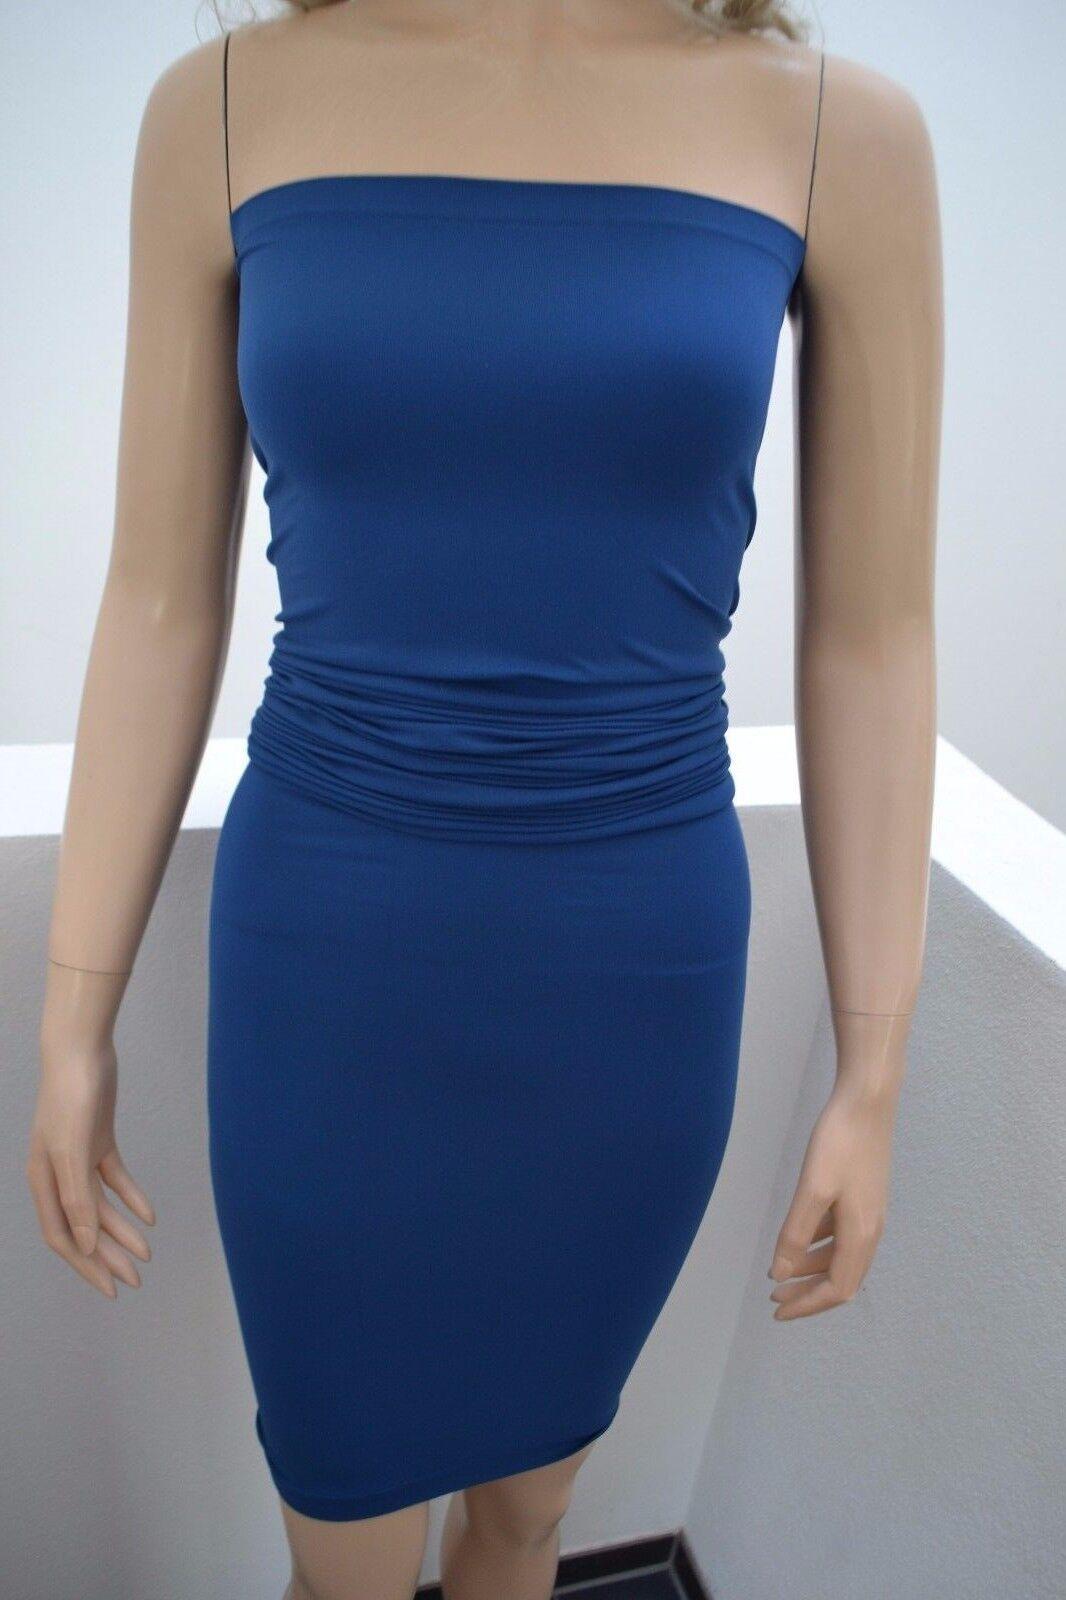 Wolford Fatal Kleid Kleid Tube oben Rock S Klein 38 40 Electric blau